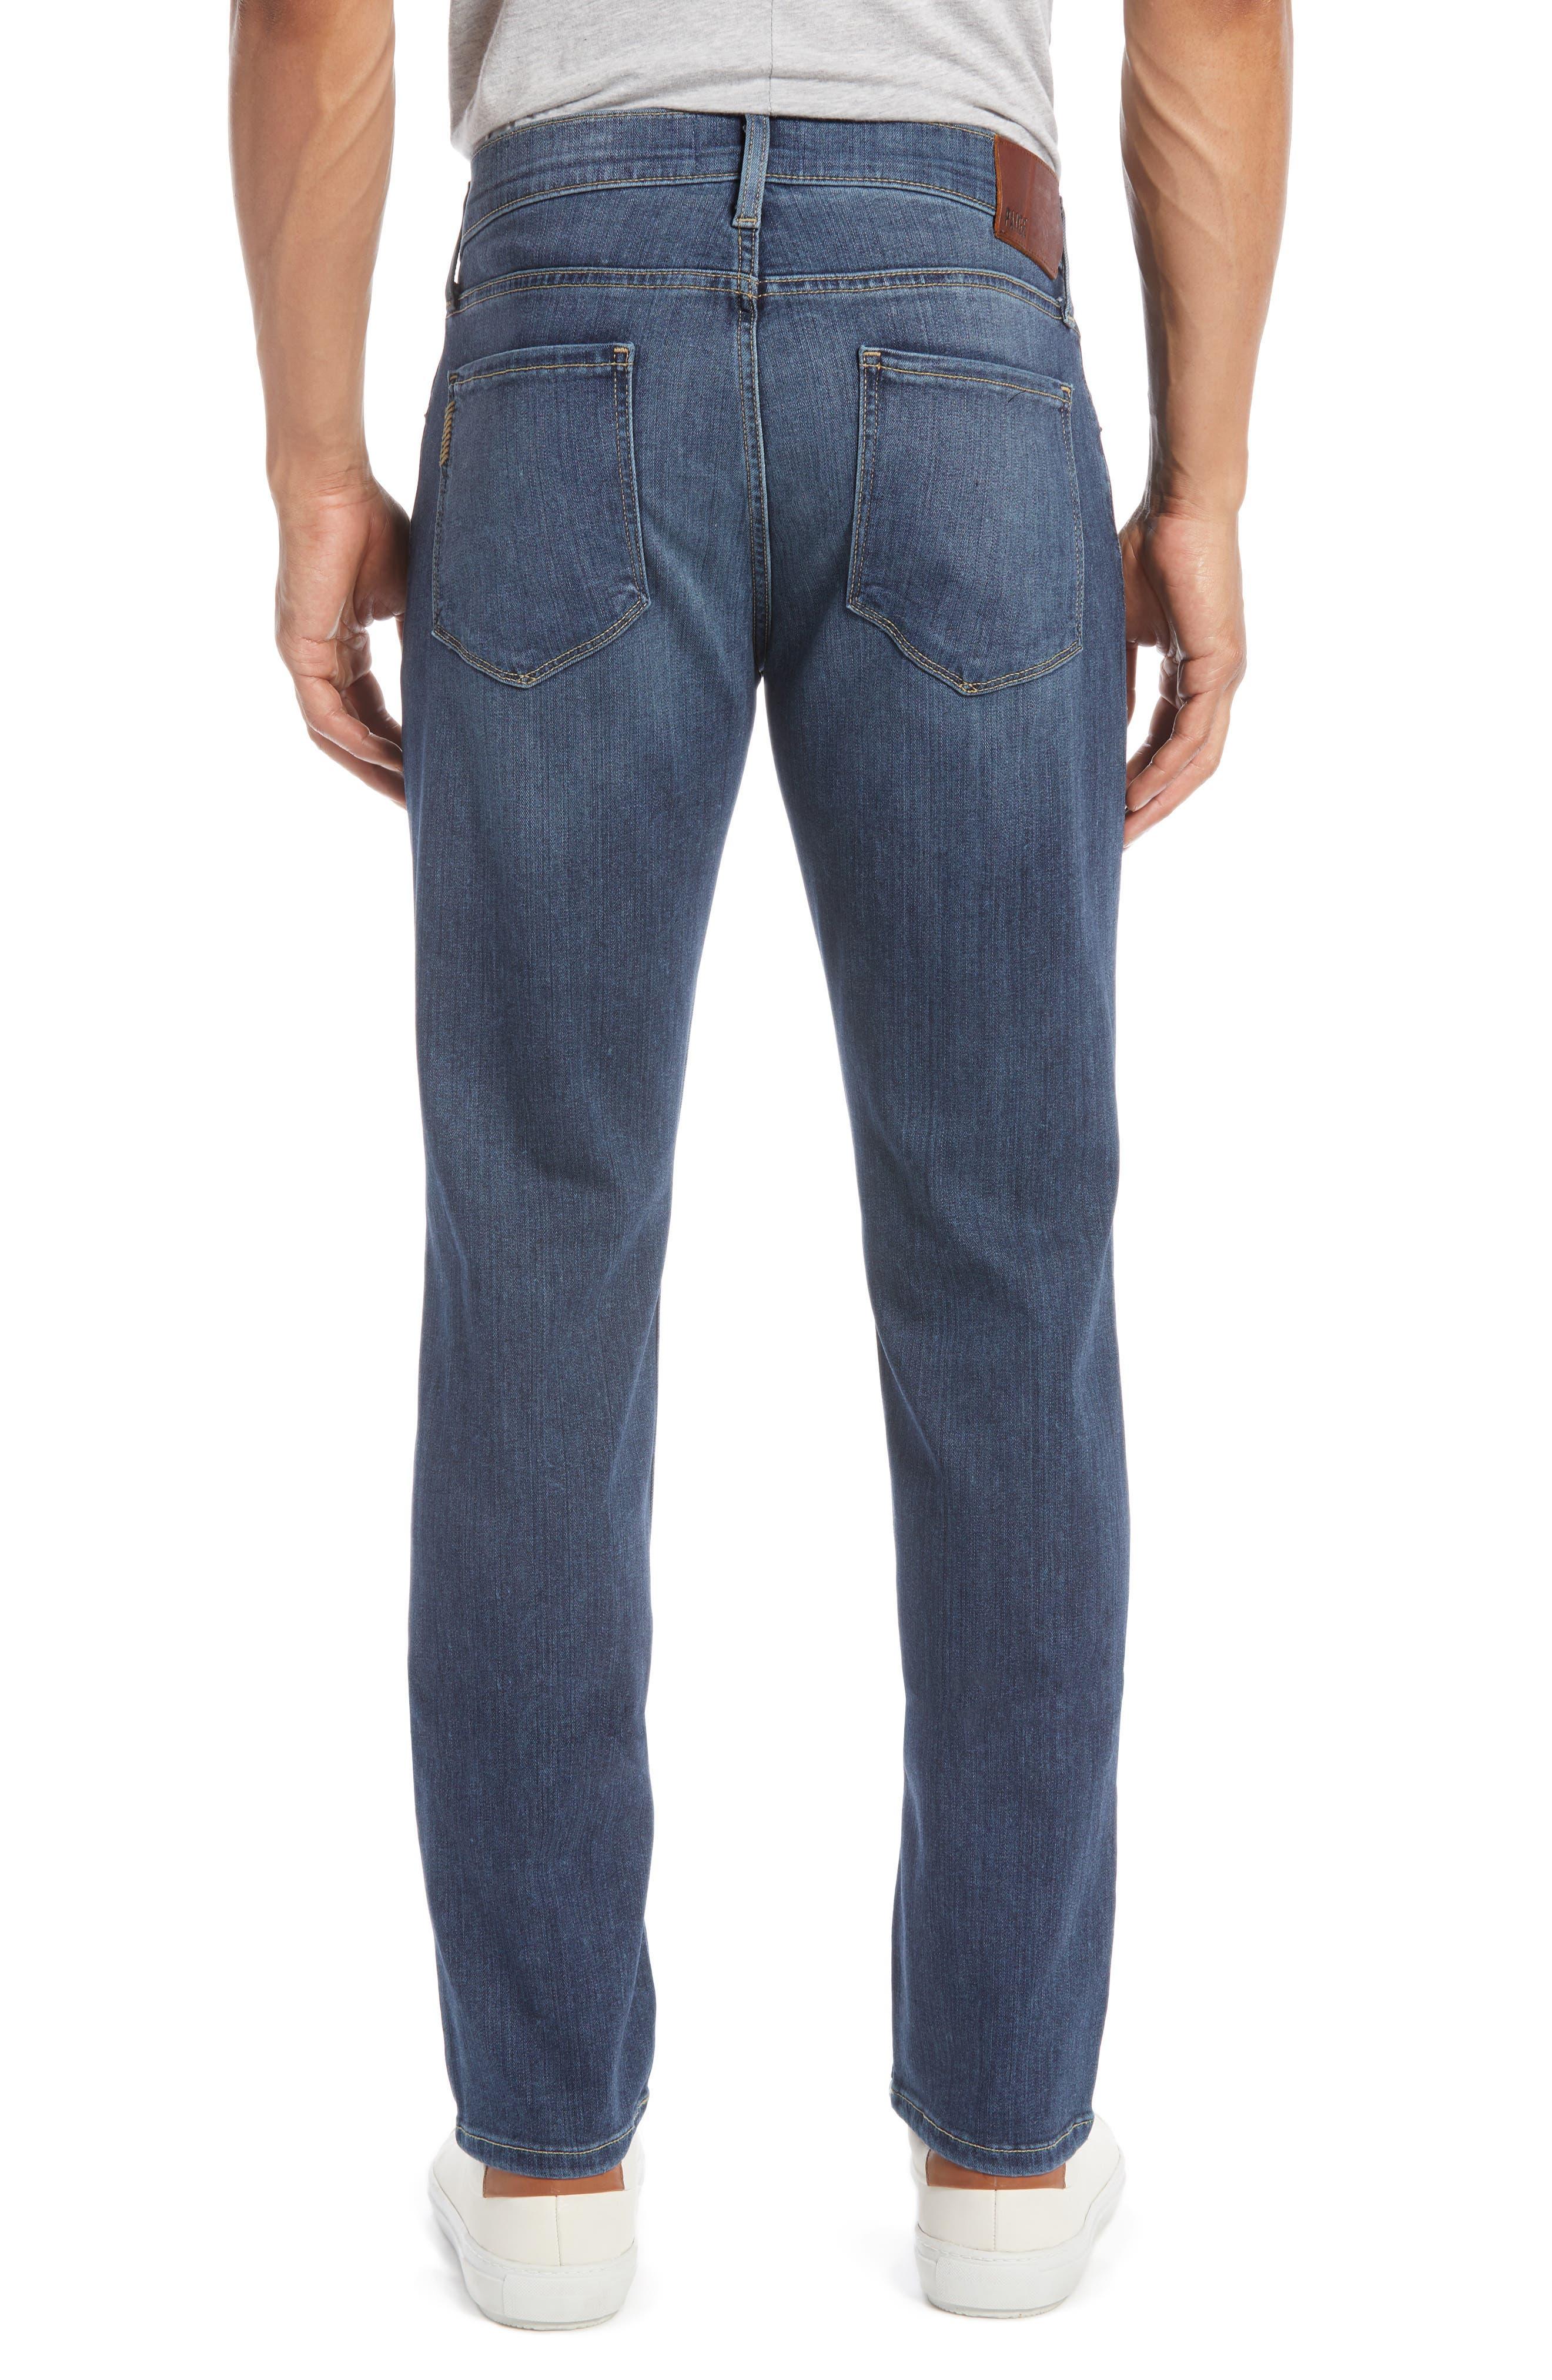 PAIGE, Transcend - Federal Slim Straight Leg Jeans, Alternate thumbnail 4, color, BIRCH